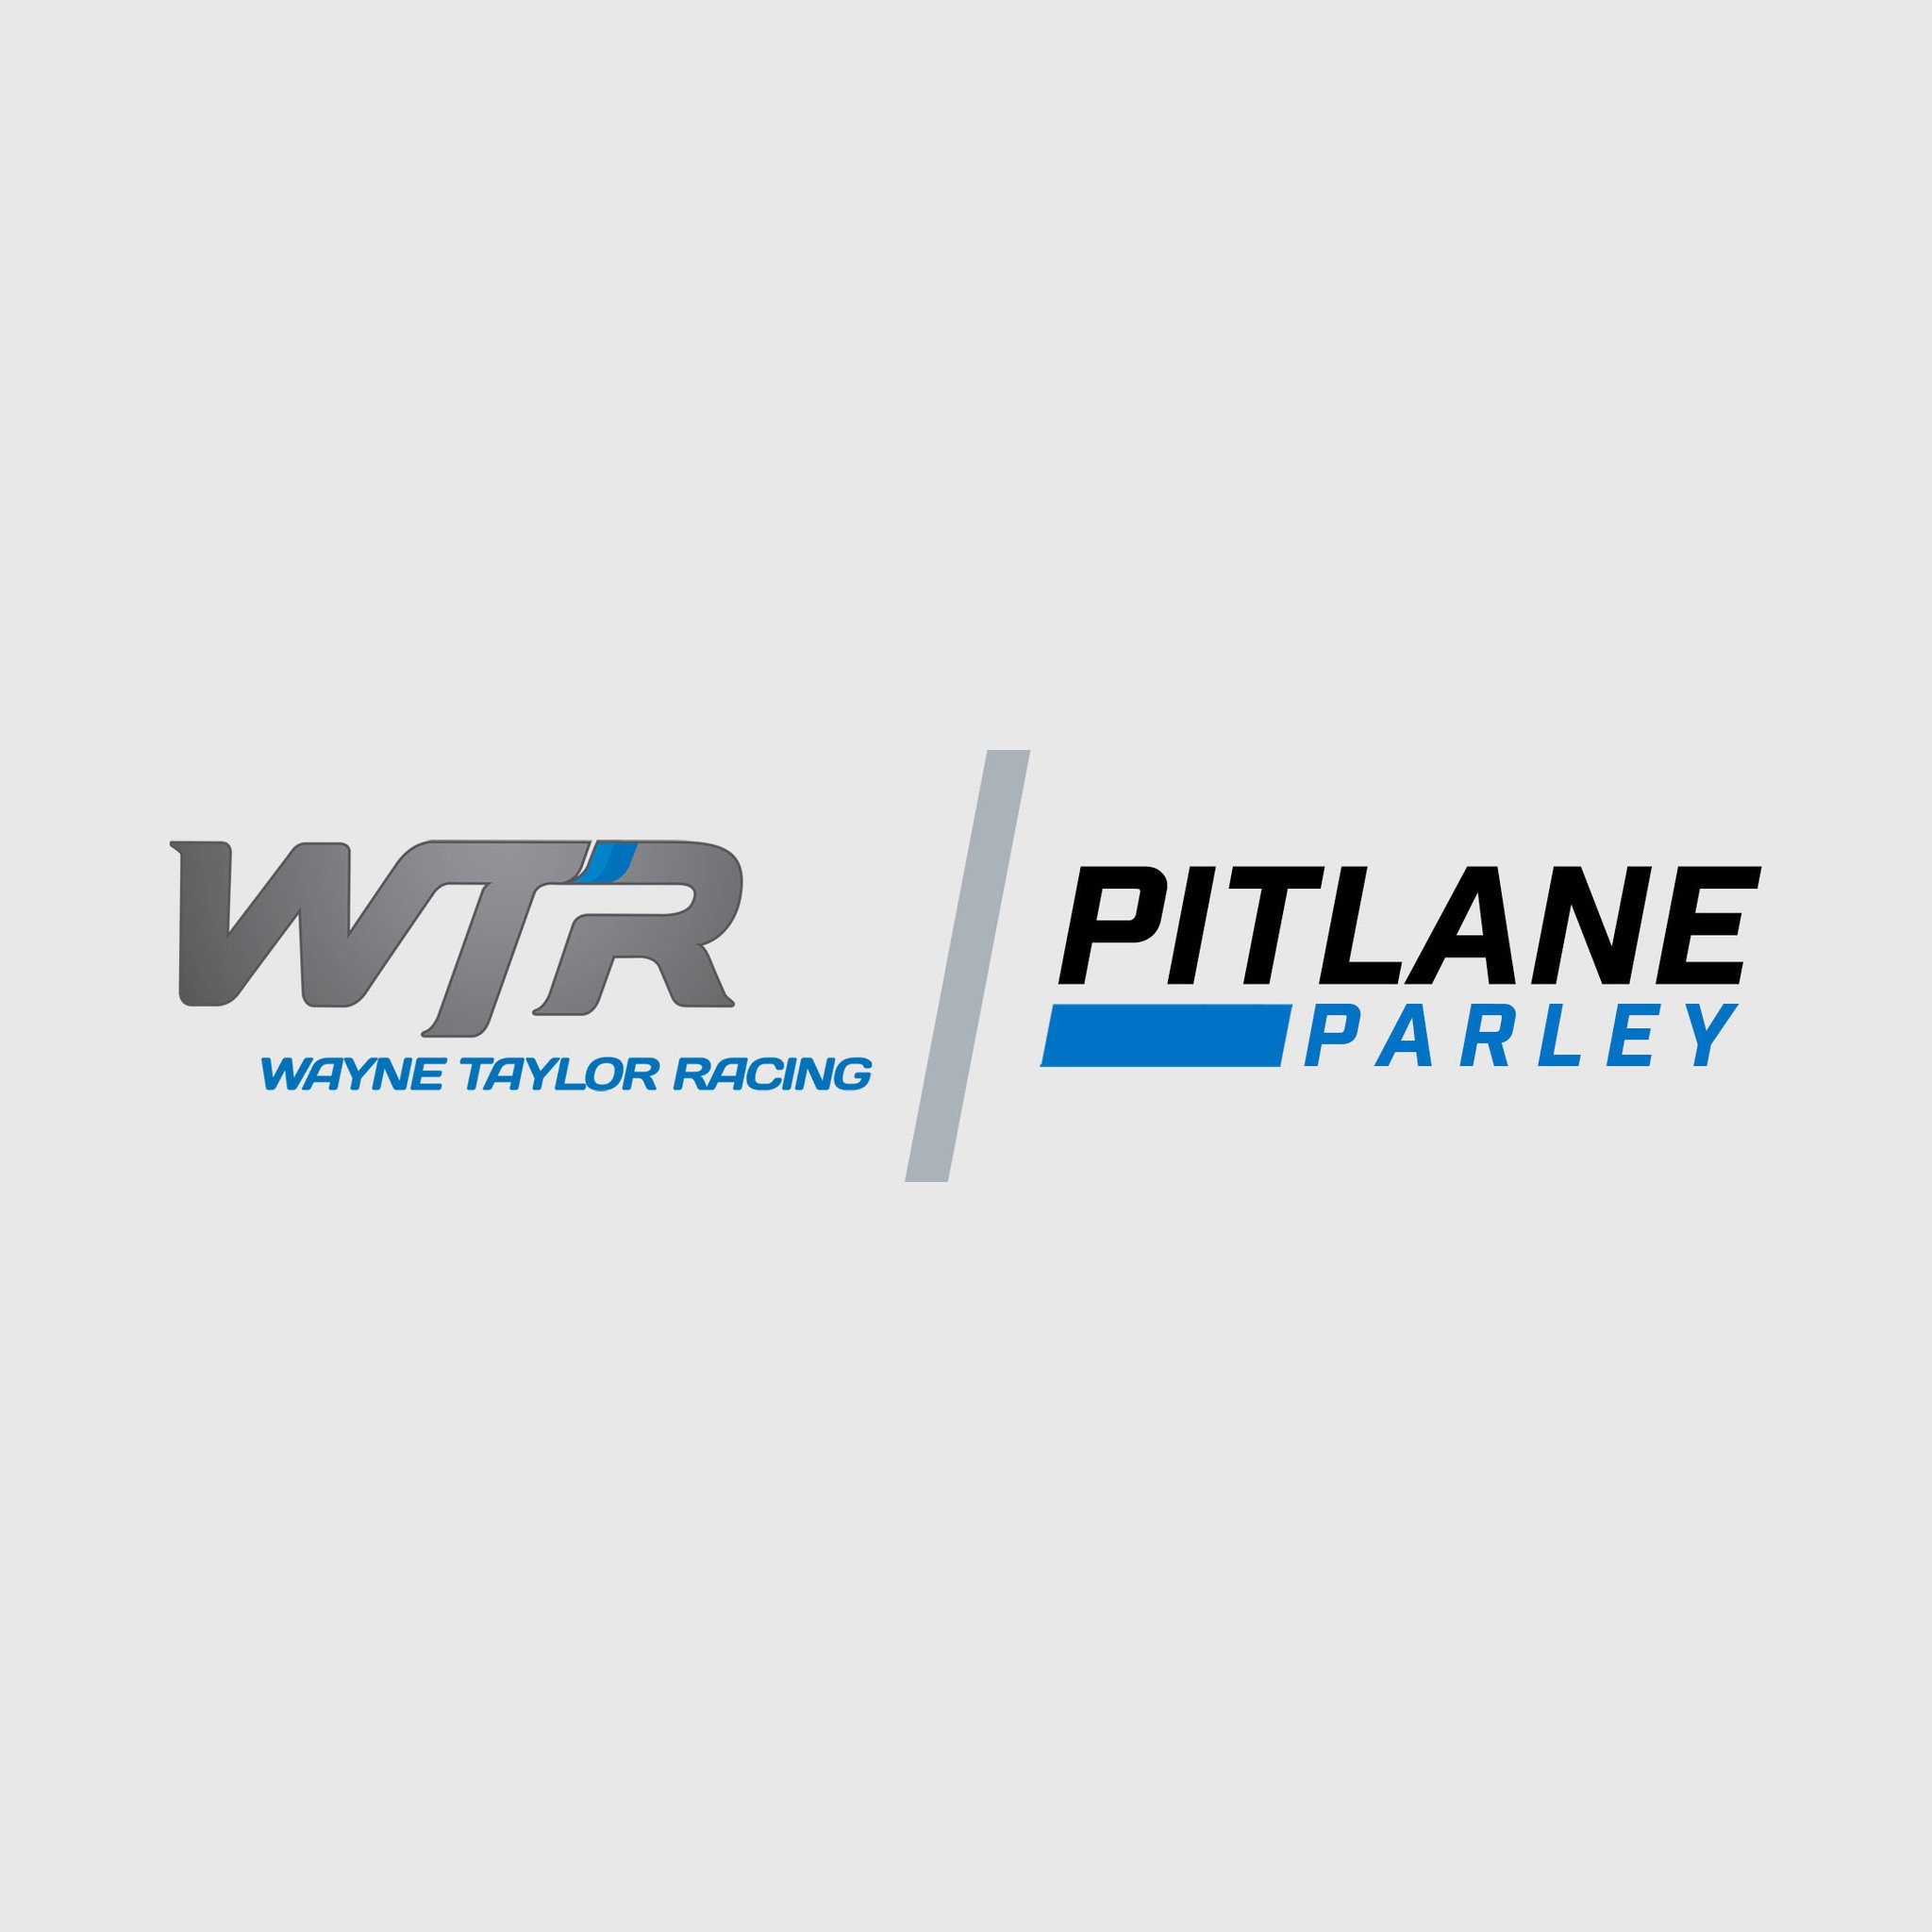 This Week with Wayne Taylor Racing: Talking with Technical Director Brian Pillar and Engineer Logan Sprung